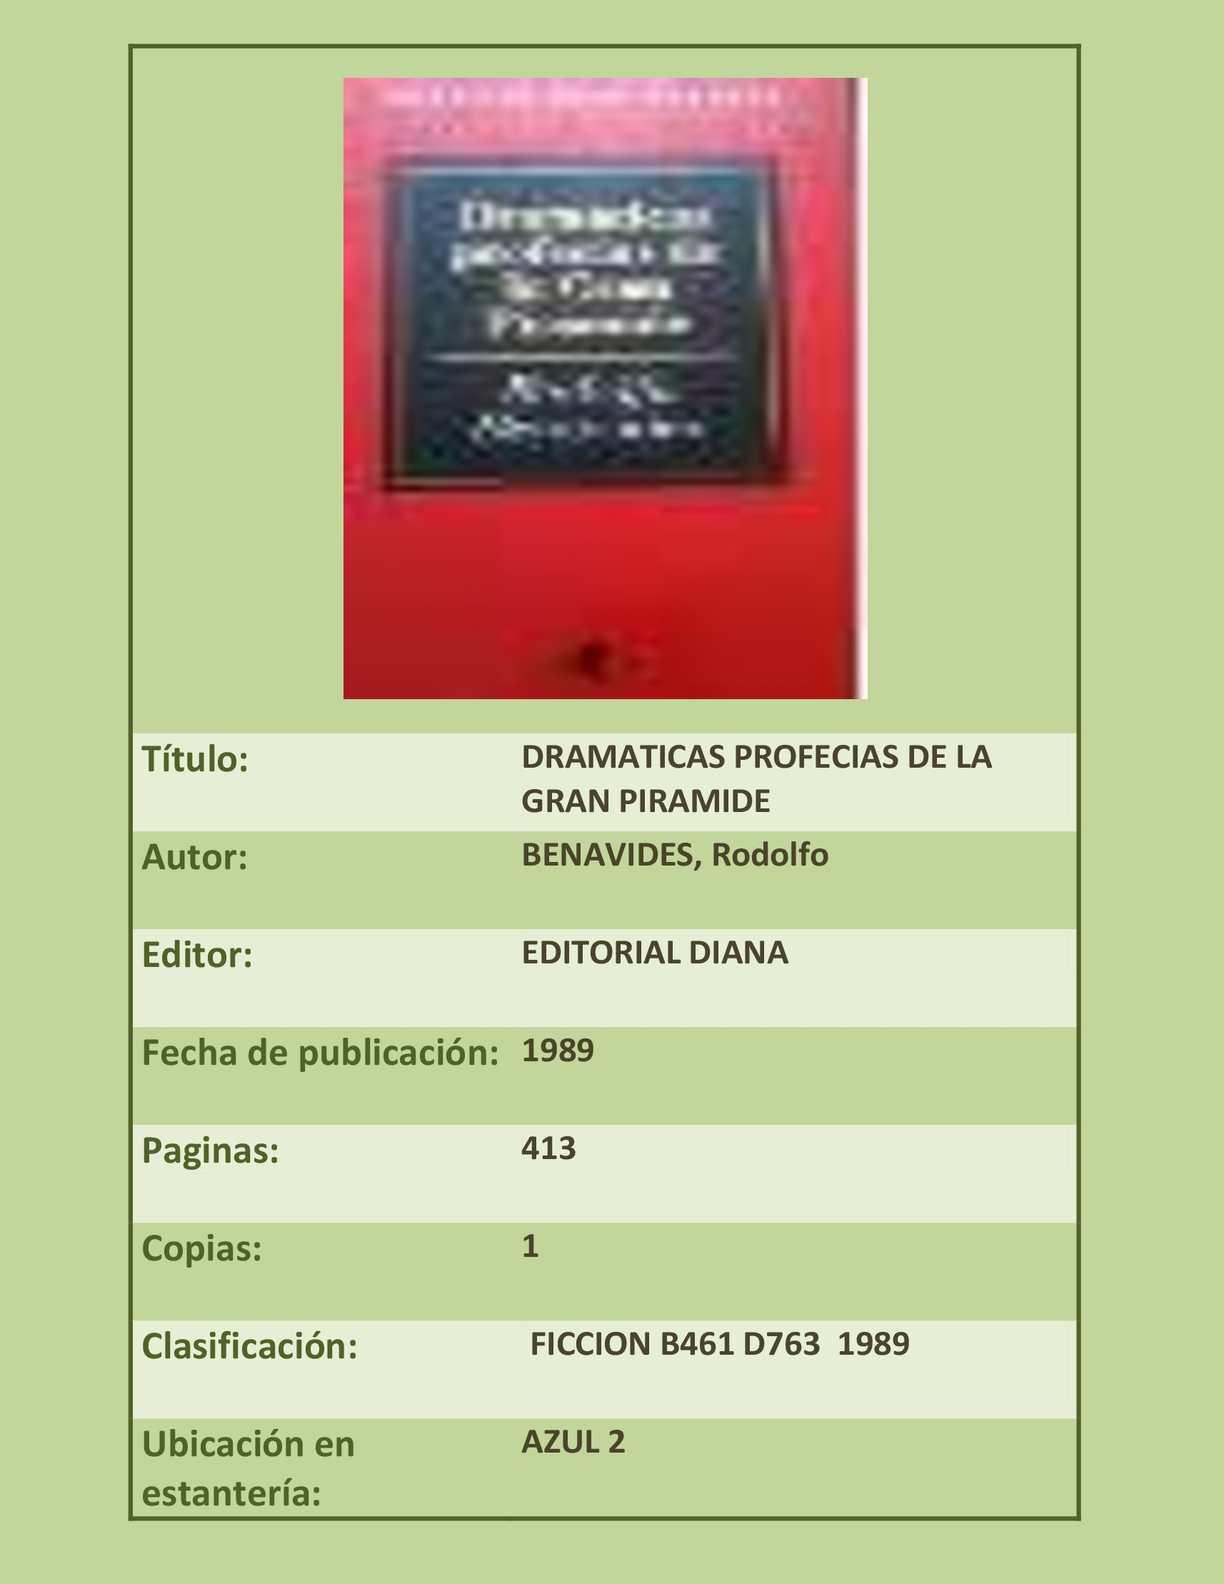 DRAMATICAS PROFECIAS DE LA GRAN PIRAMIDE-BENAVIDES, Rodolfo